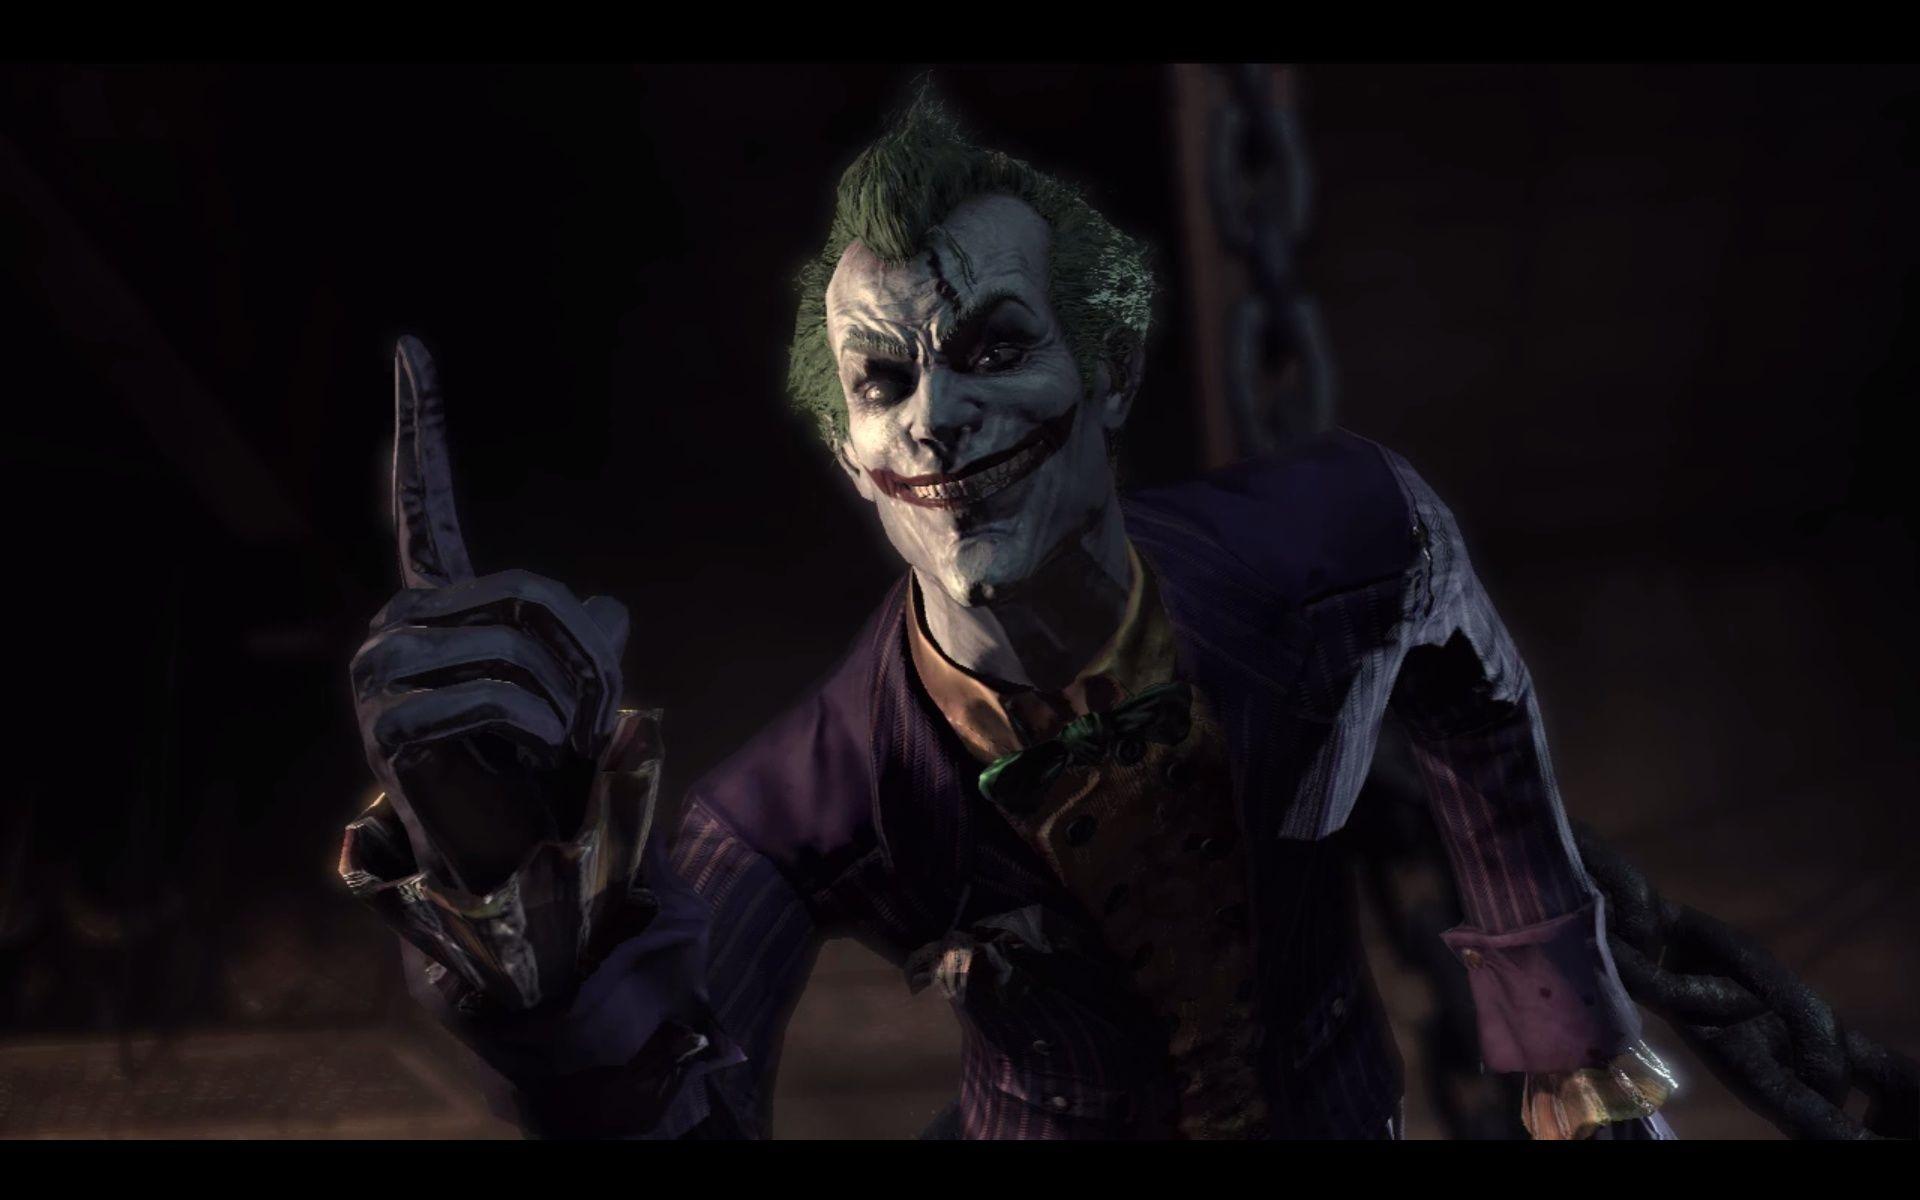 388206-batman-arkham-asylum-windows-screenshot-joker-is-having-fun